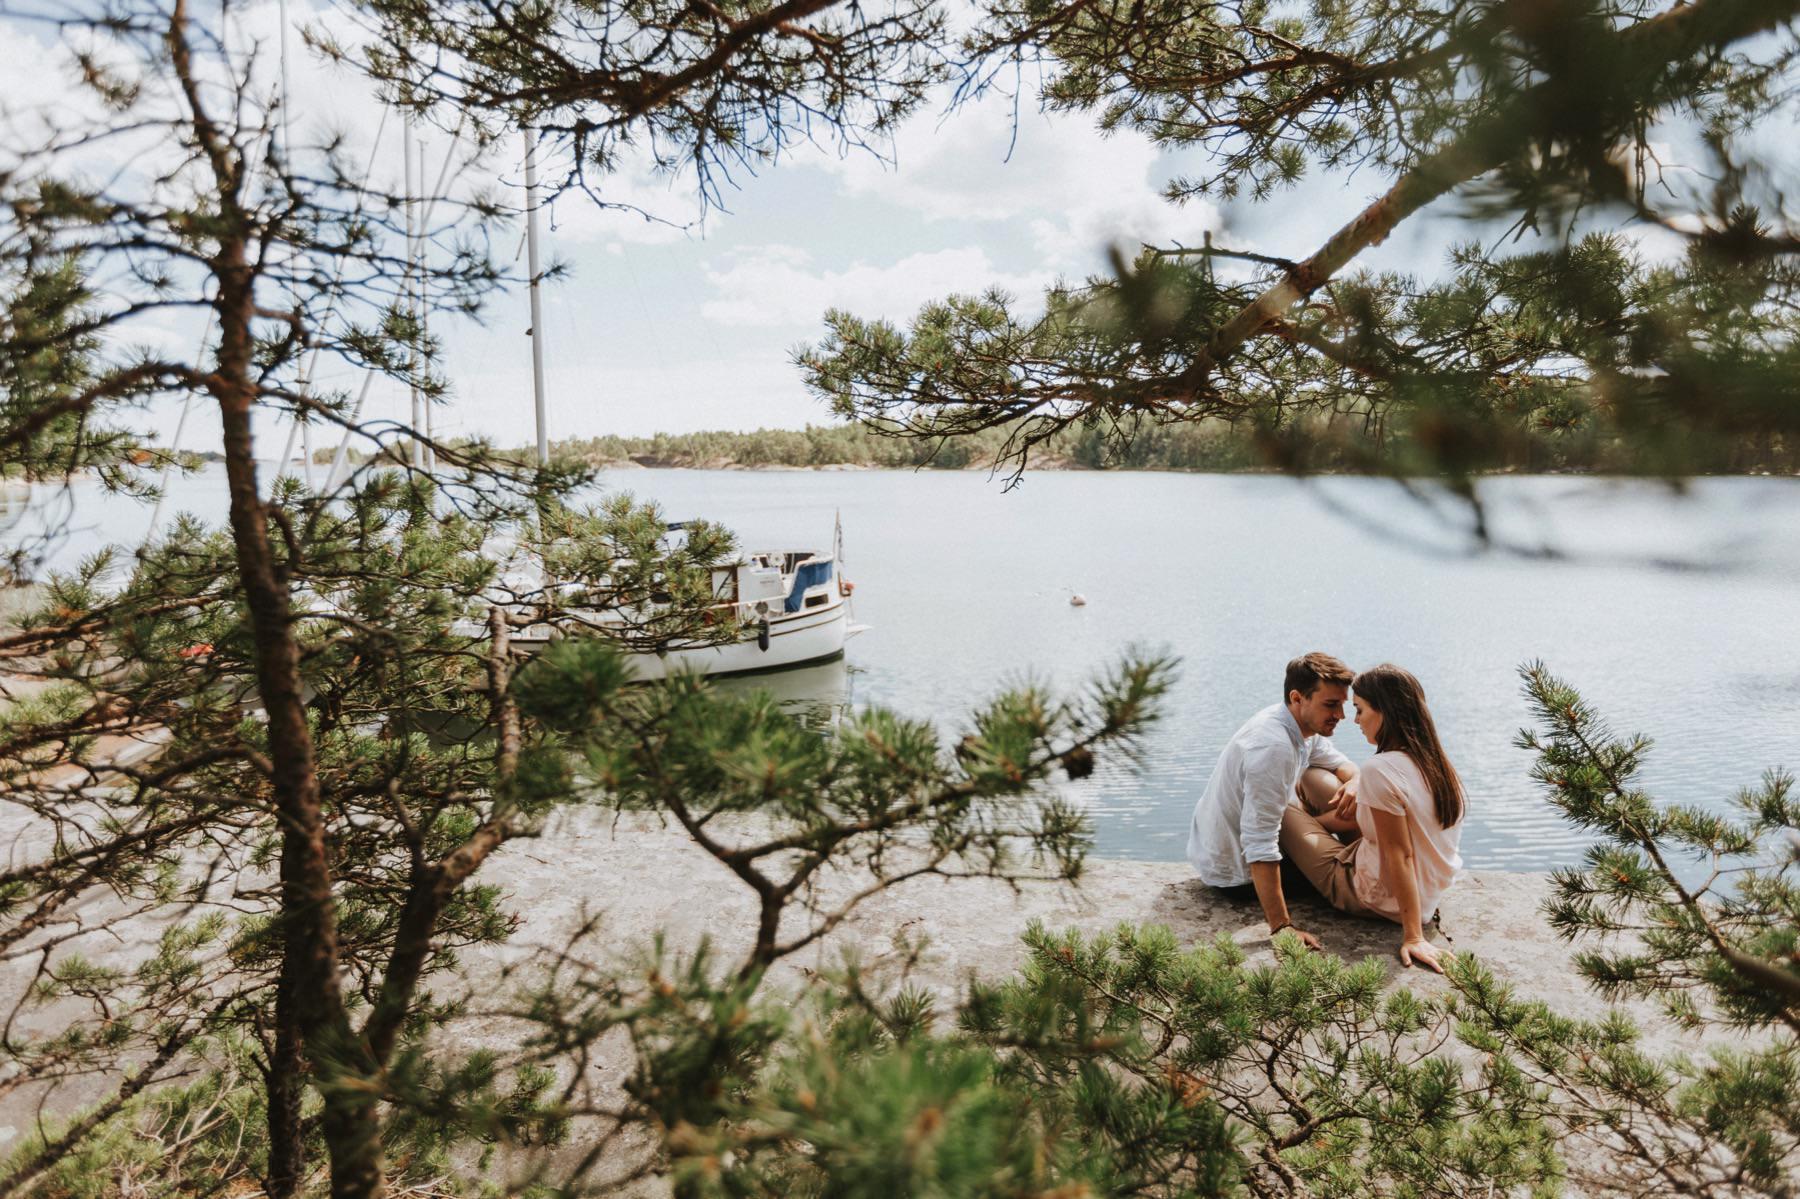 archipelago sailing photo session